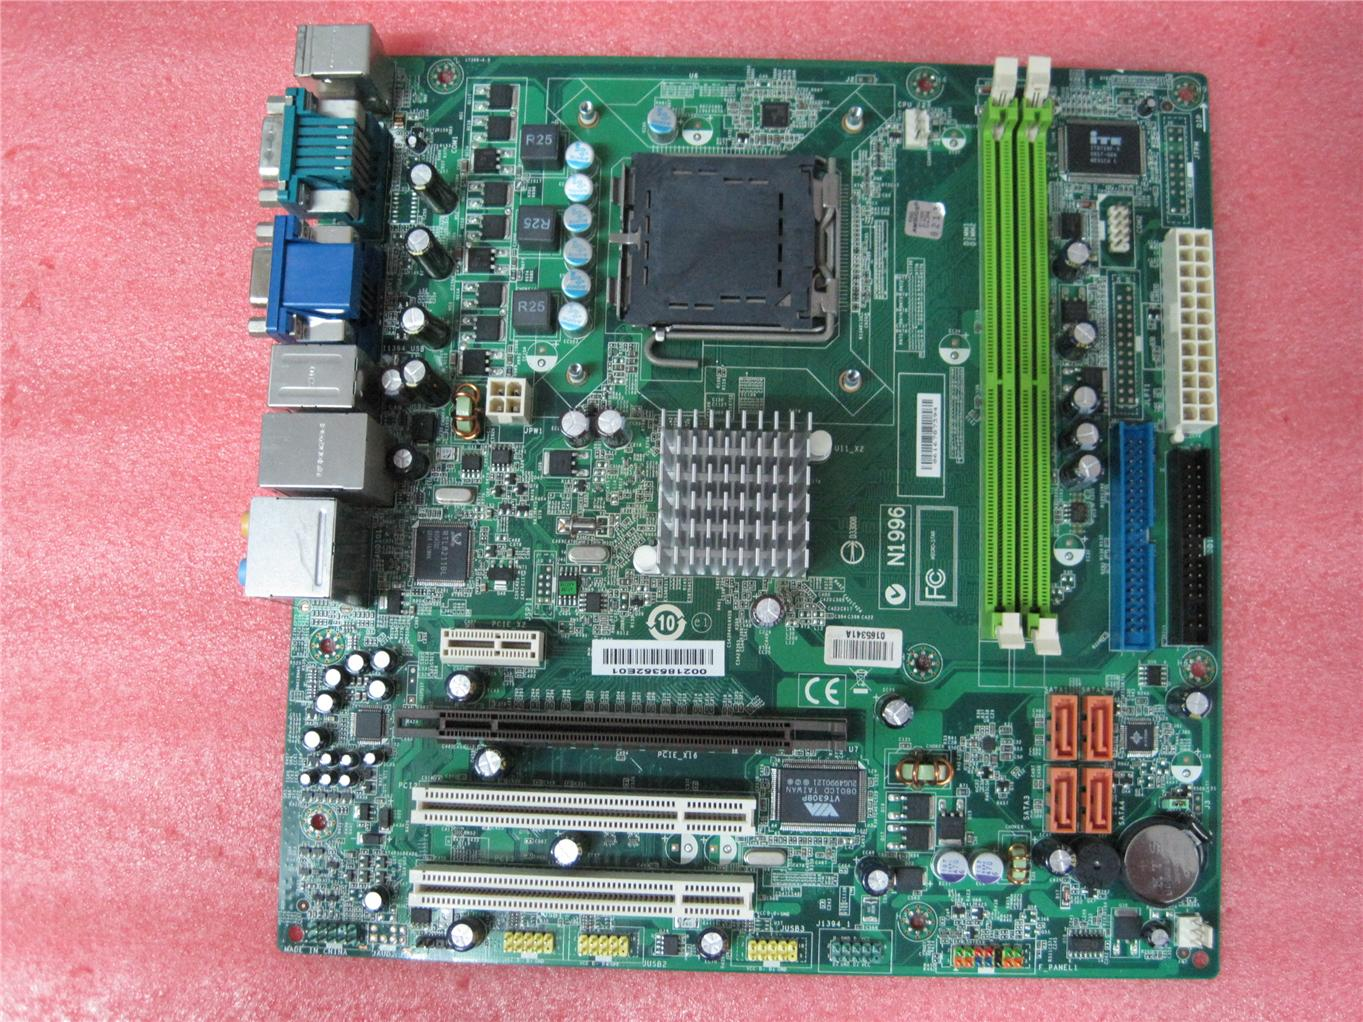 acer aspire m3640 m3641 socket 775 m end 9 29 2018 2 44 pm rh lelong com my Acer Aspire Motherboard Testing Acer Aspire 5517 AMD